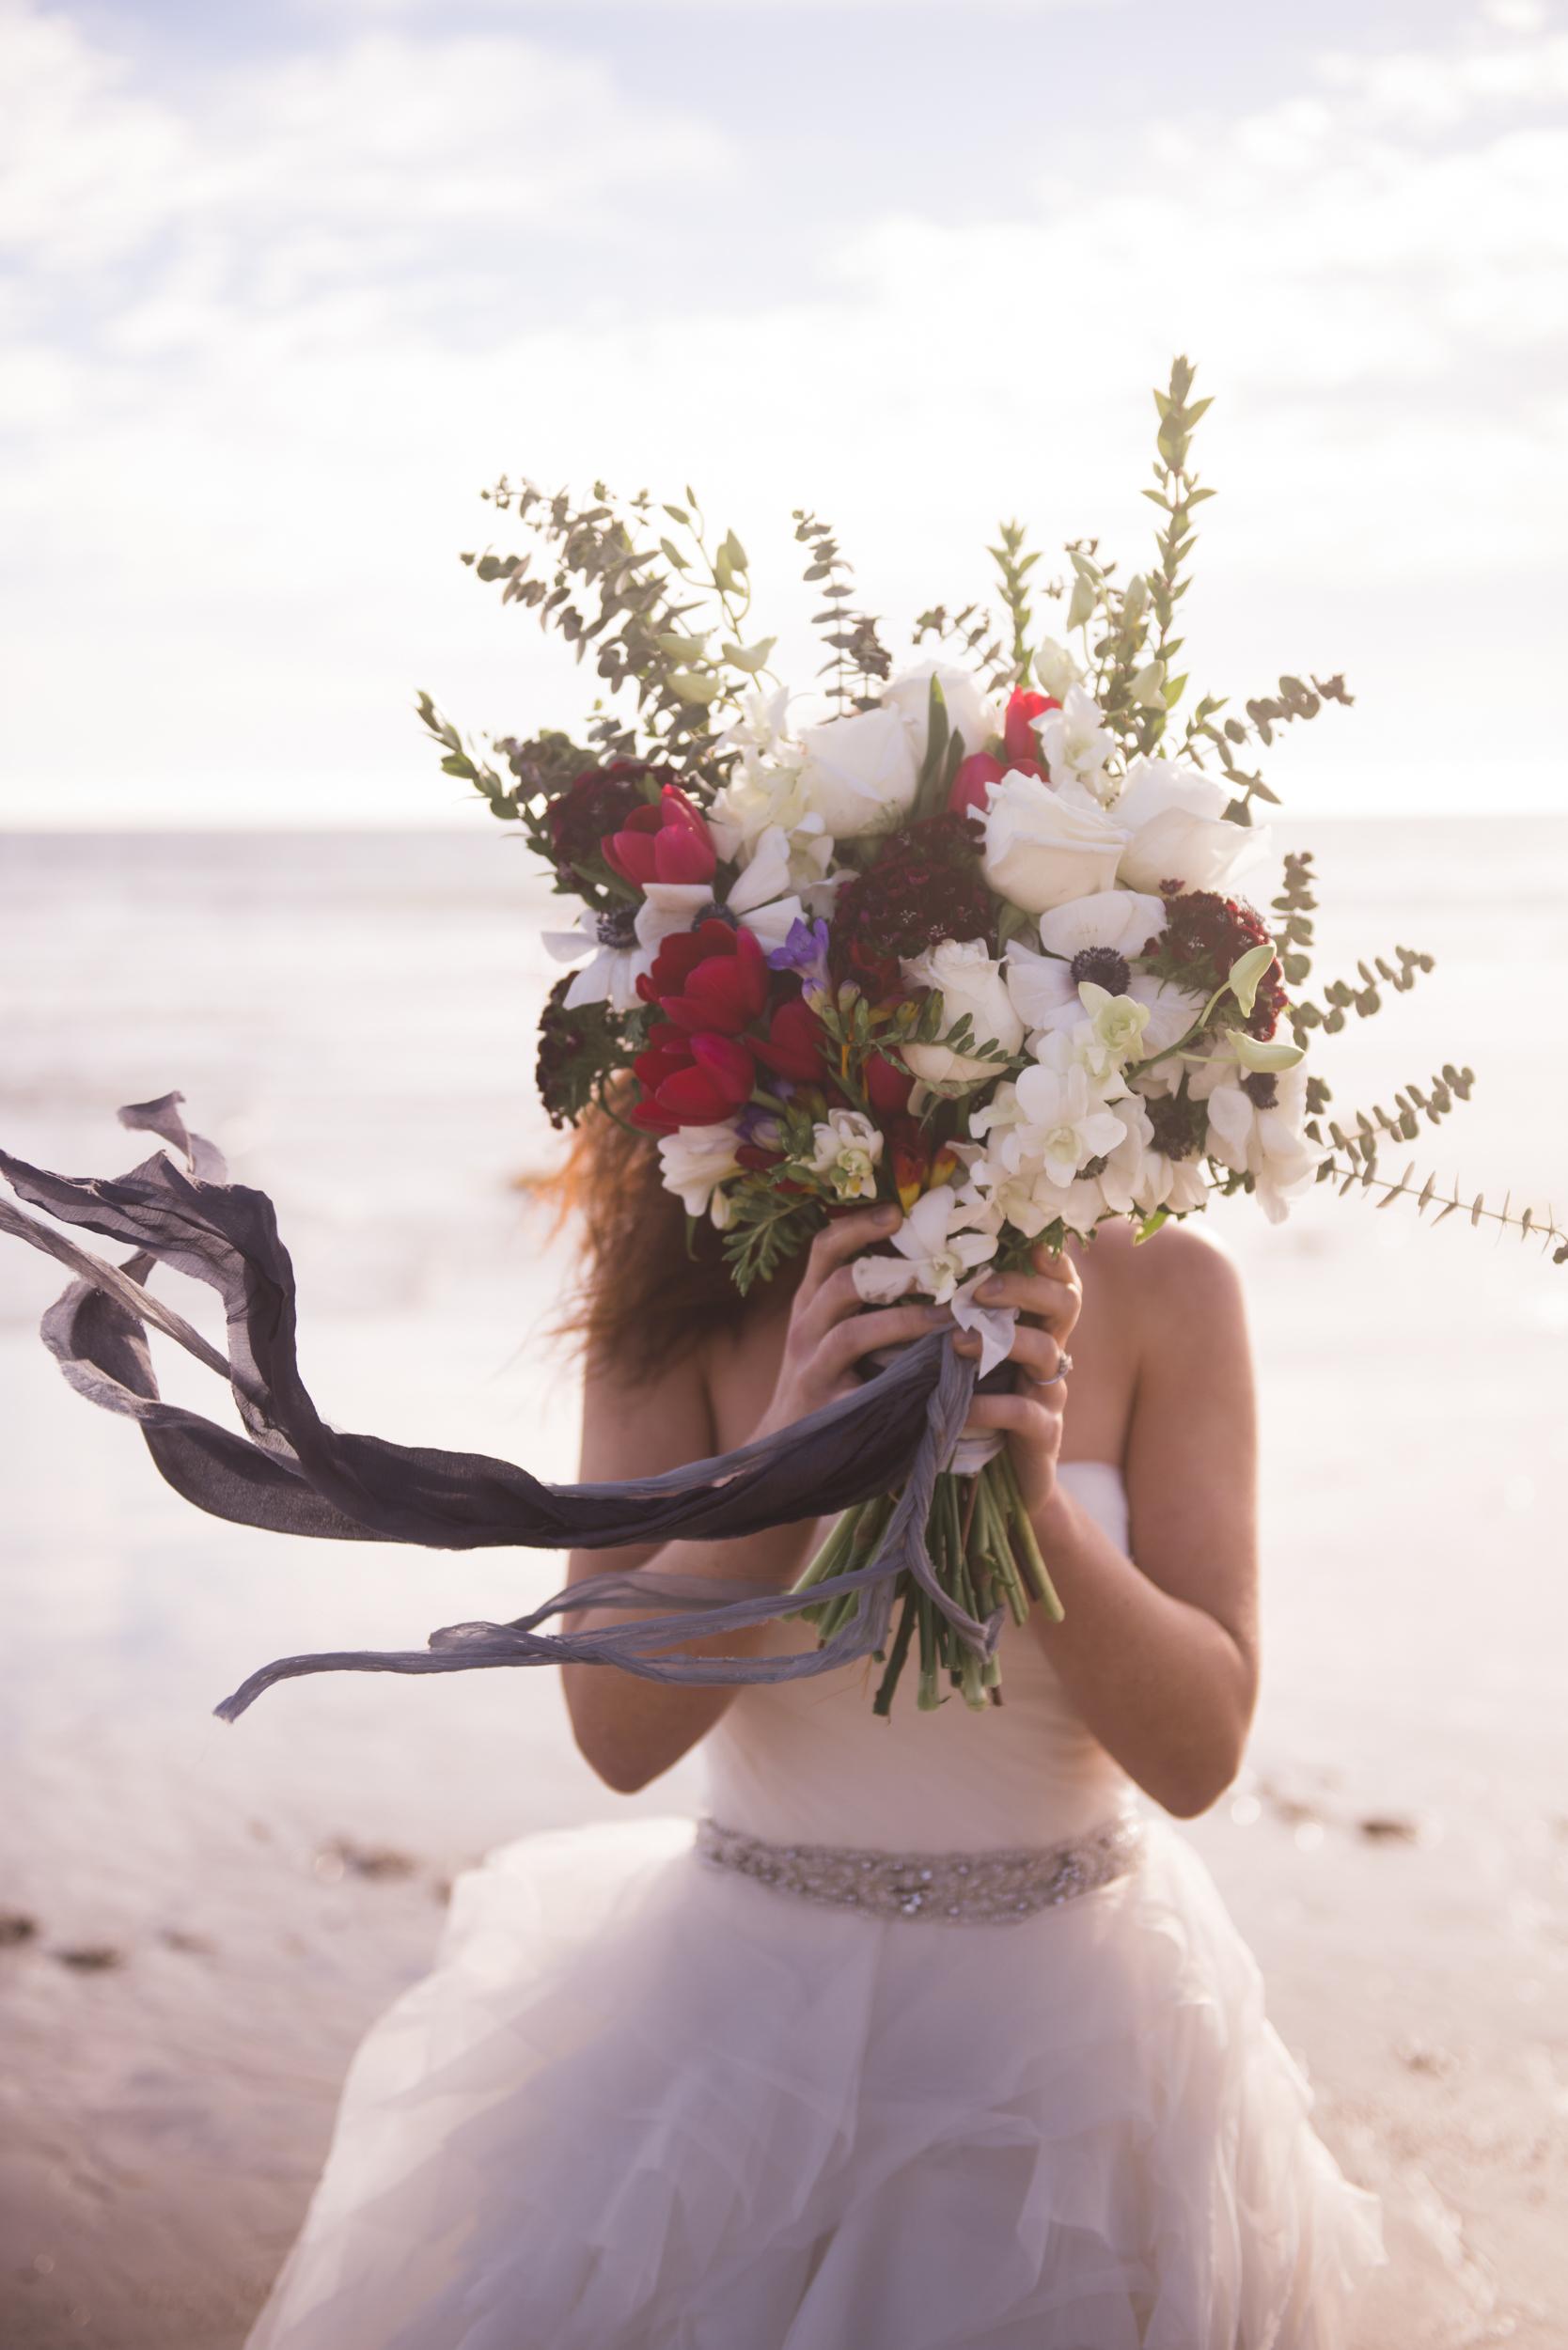 arthousephotographs.com | Los Angeles Wedding Photographer | Seattle Wedding Photographer | Southern California Wedding Photographer | Arthouse Photographs